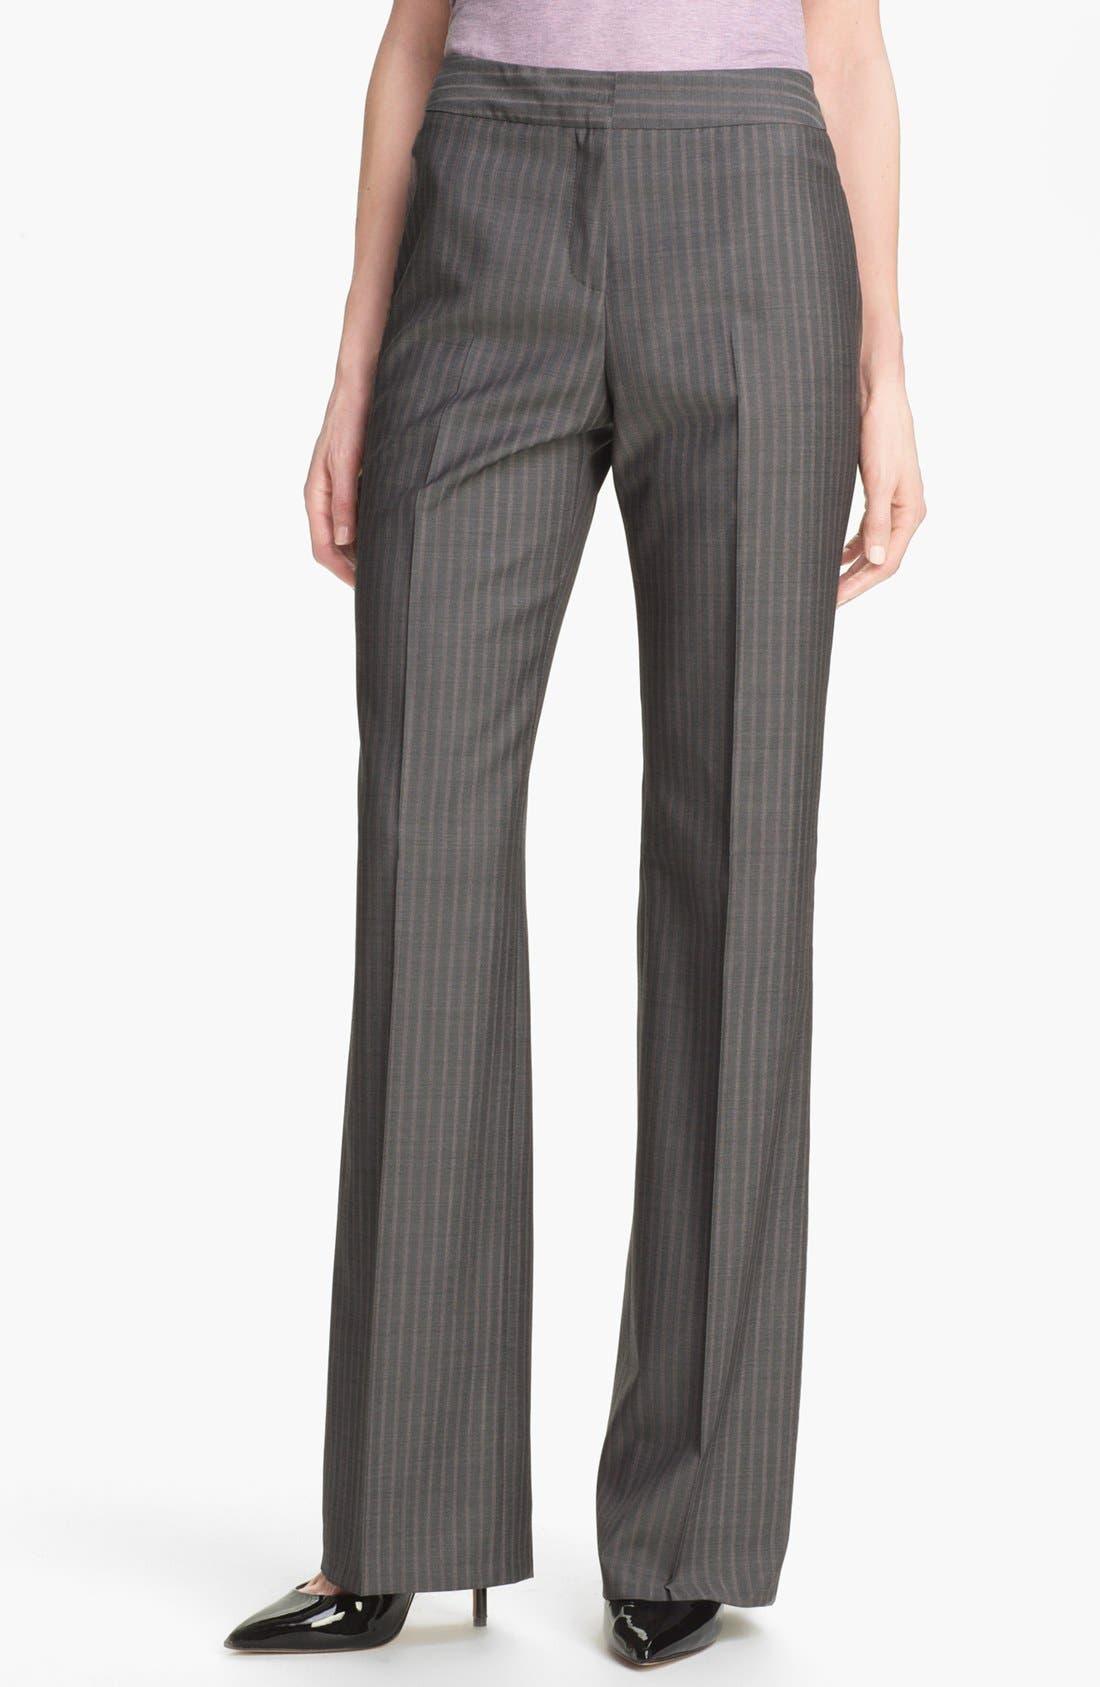 Alternate Image 1 Selected - Santorelli 'Mara' Wool Pants